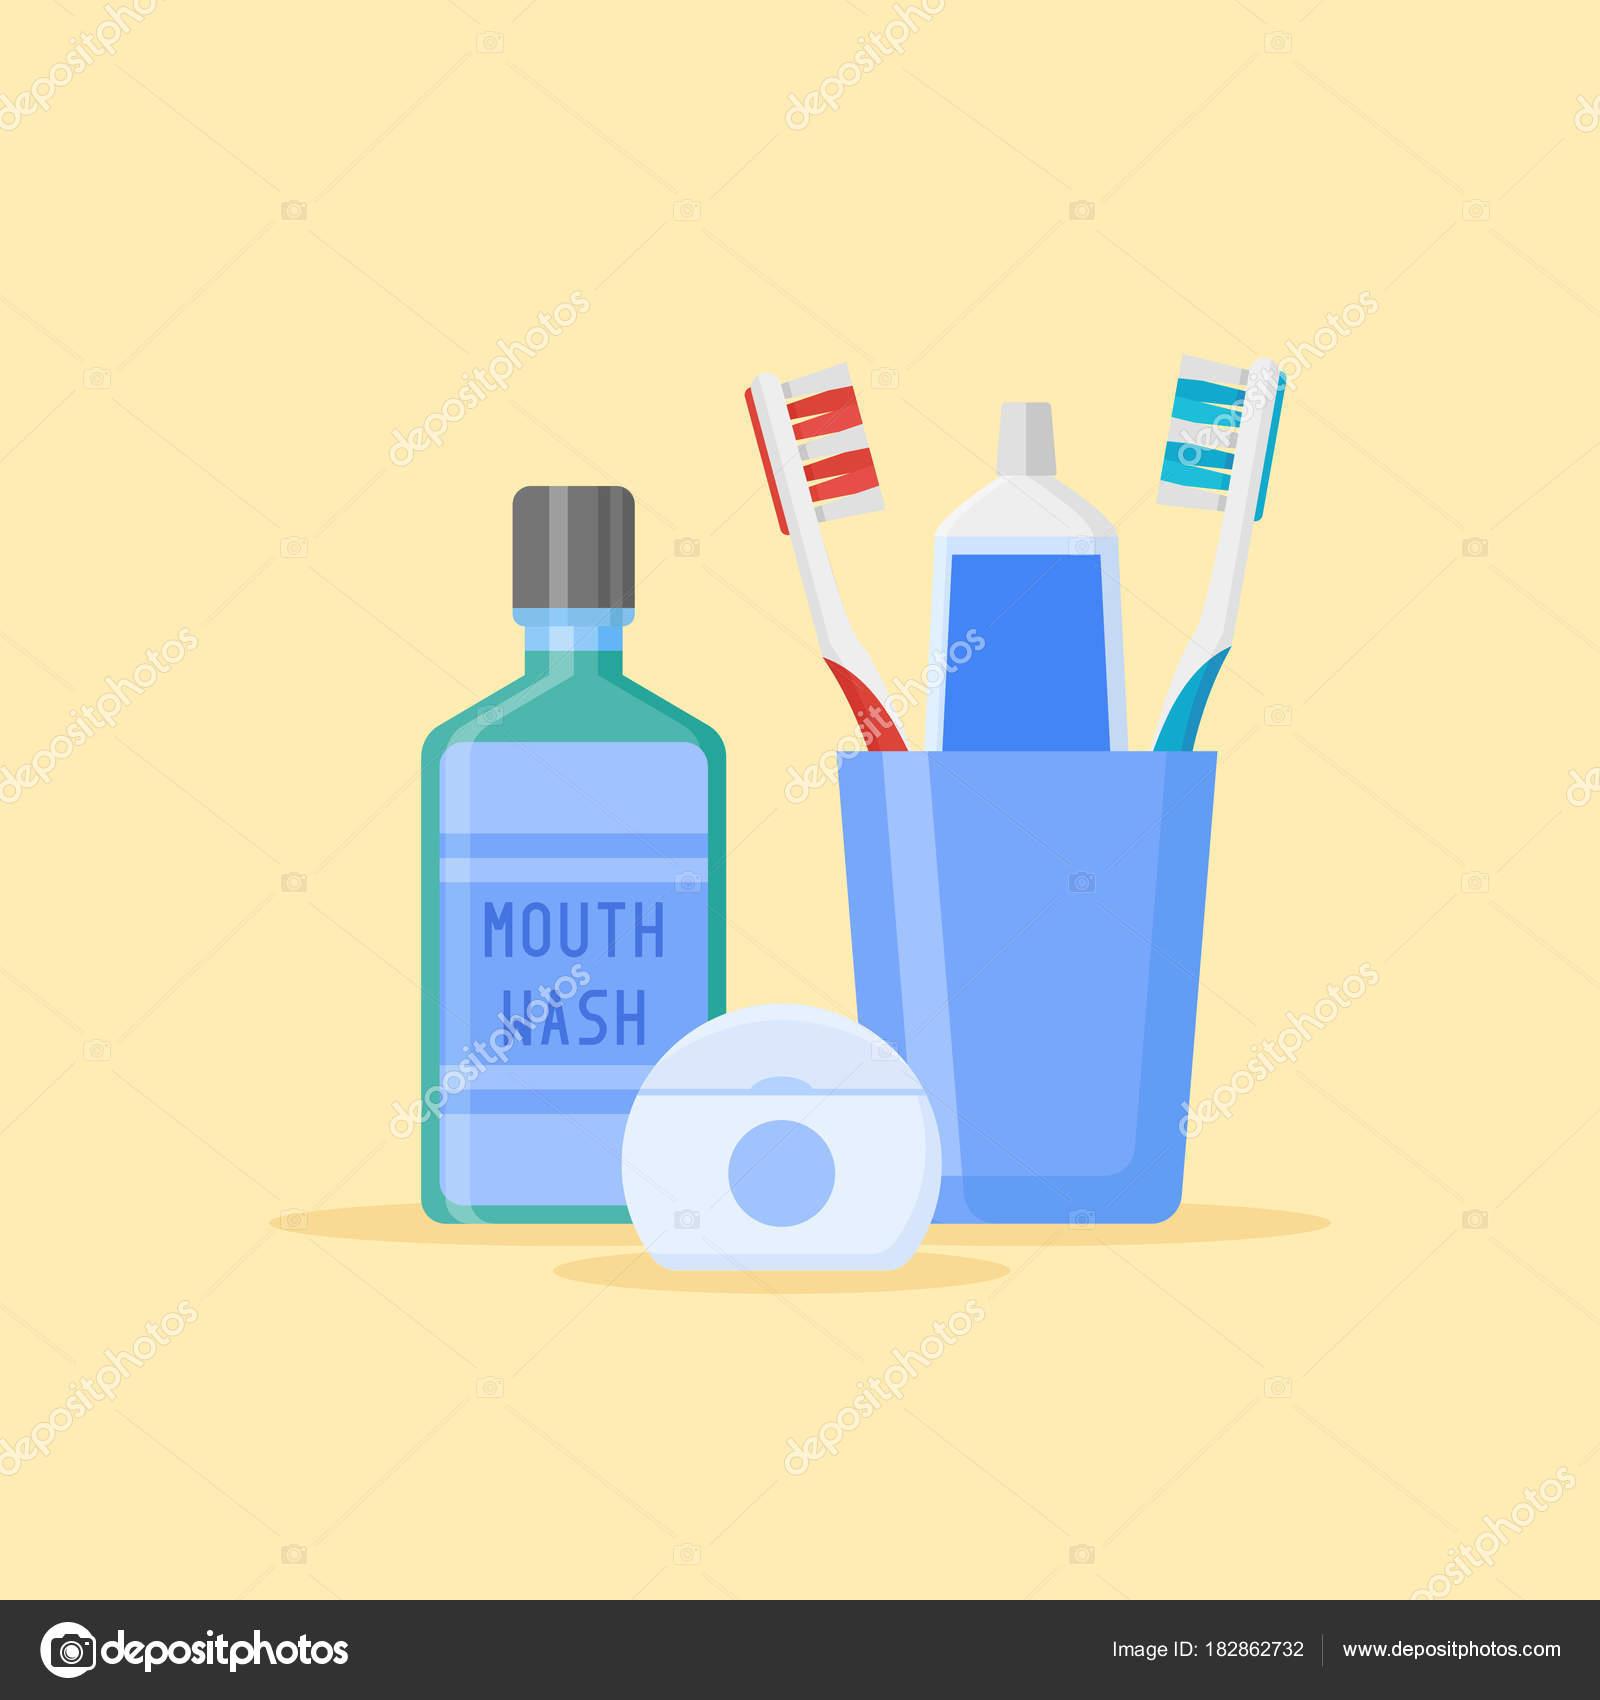 faa35e70c Conjunto de ferramentas de limpeza dentais. Escovas de dentes e pasta de  dente em vidro